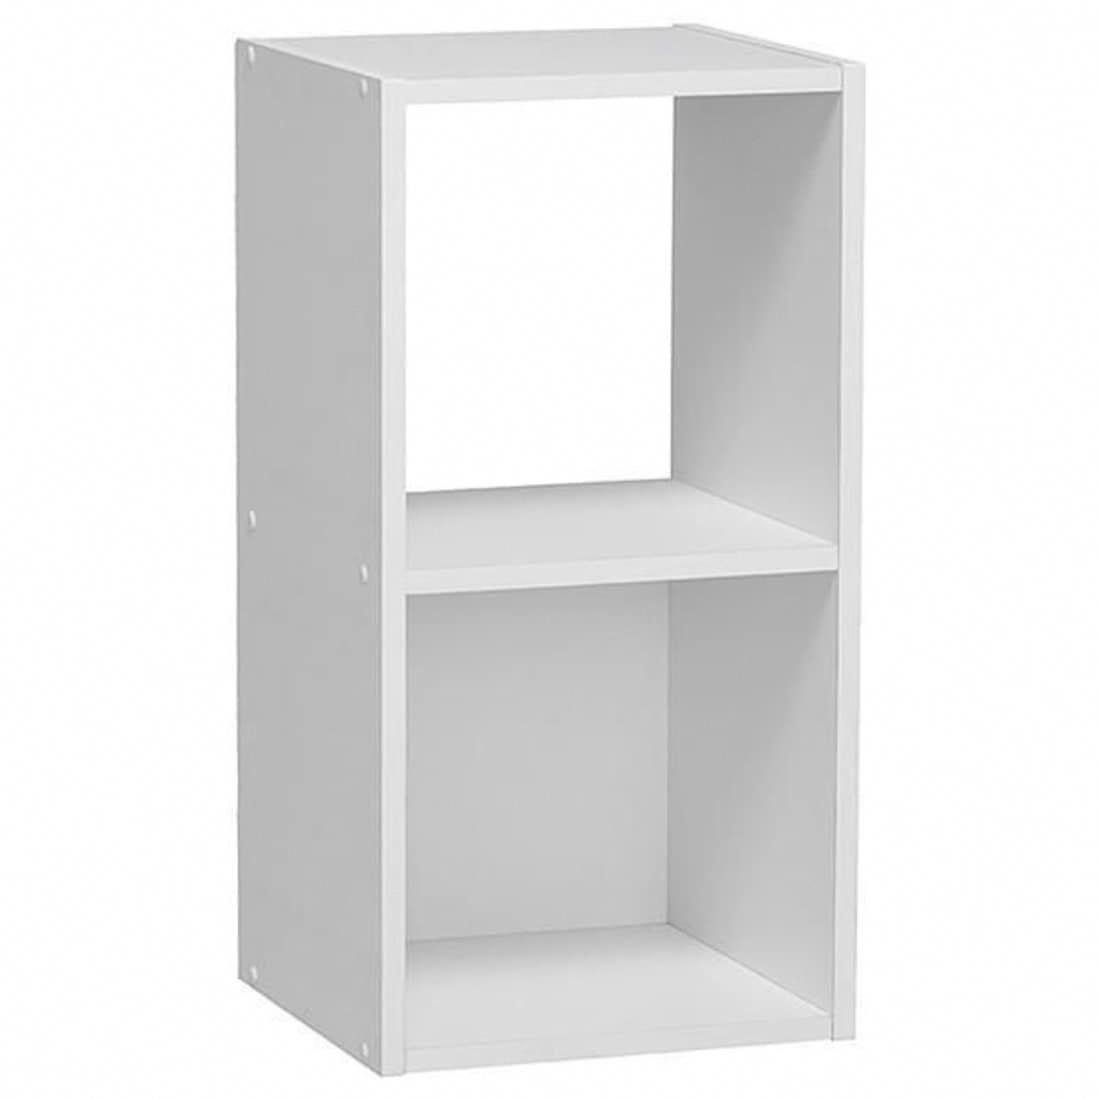 2 Cube Storage Unit White Carpetsremnantsforsale Cube Storage